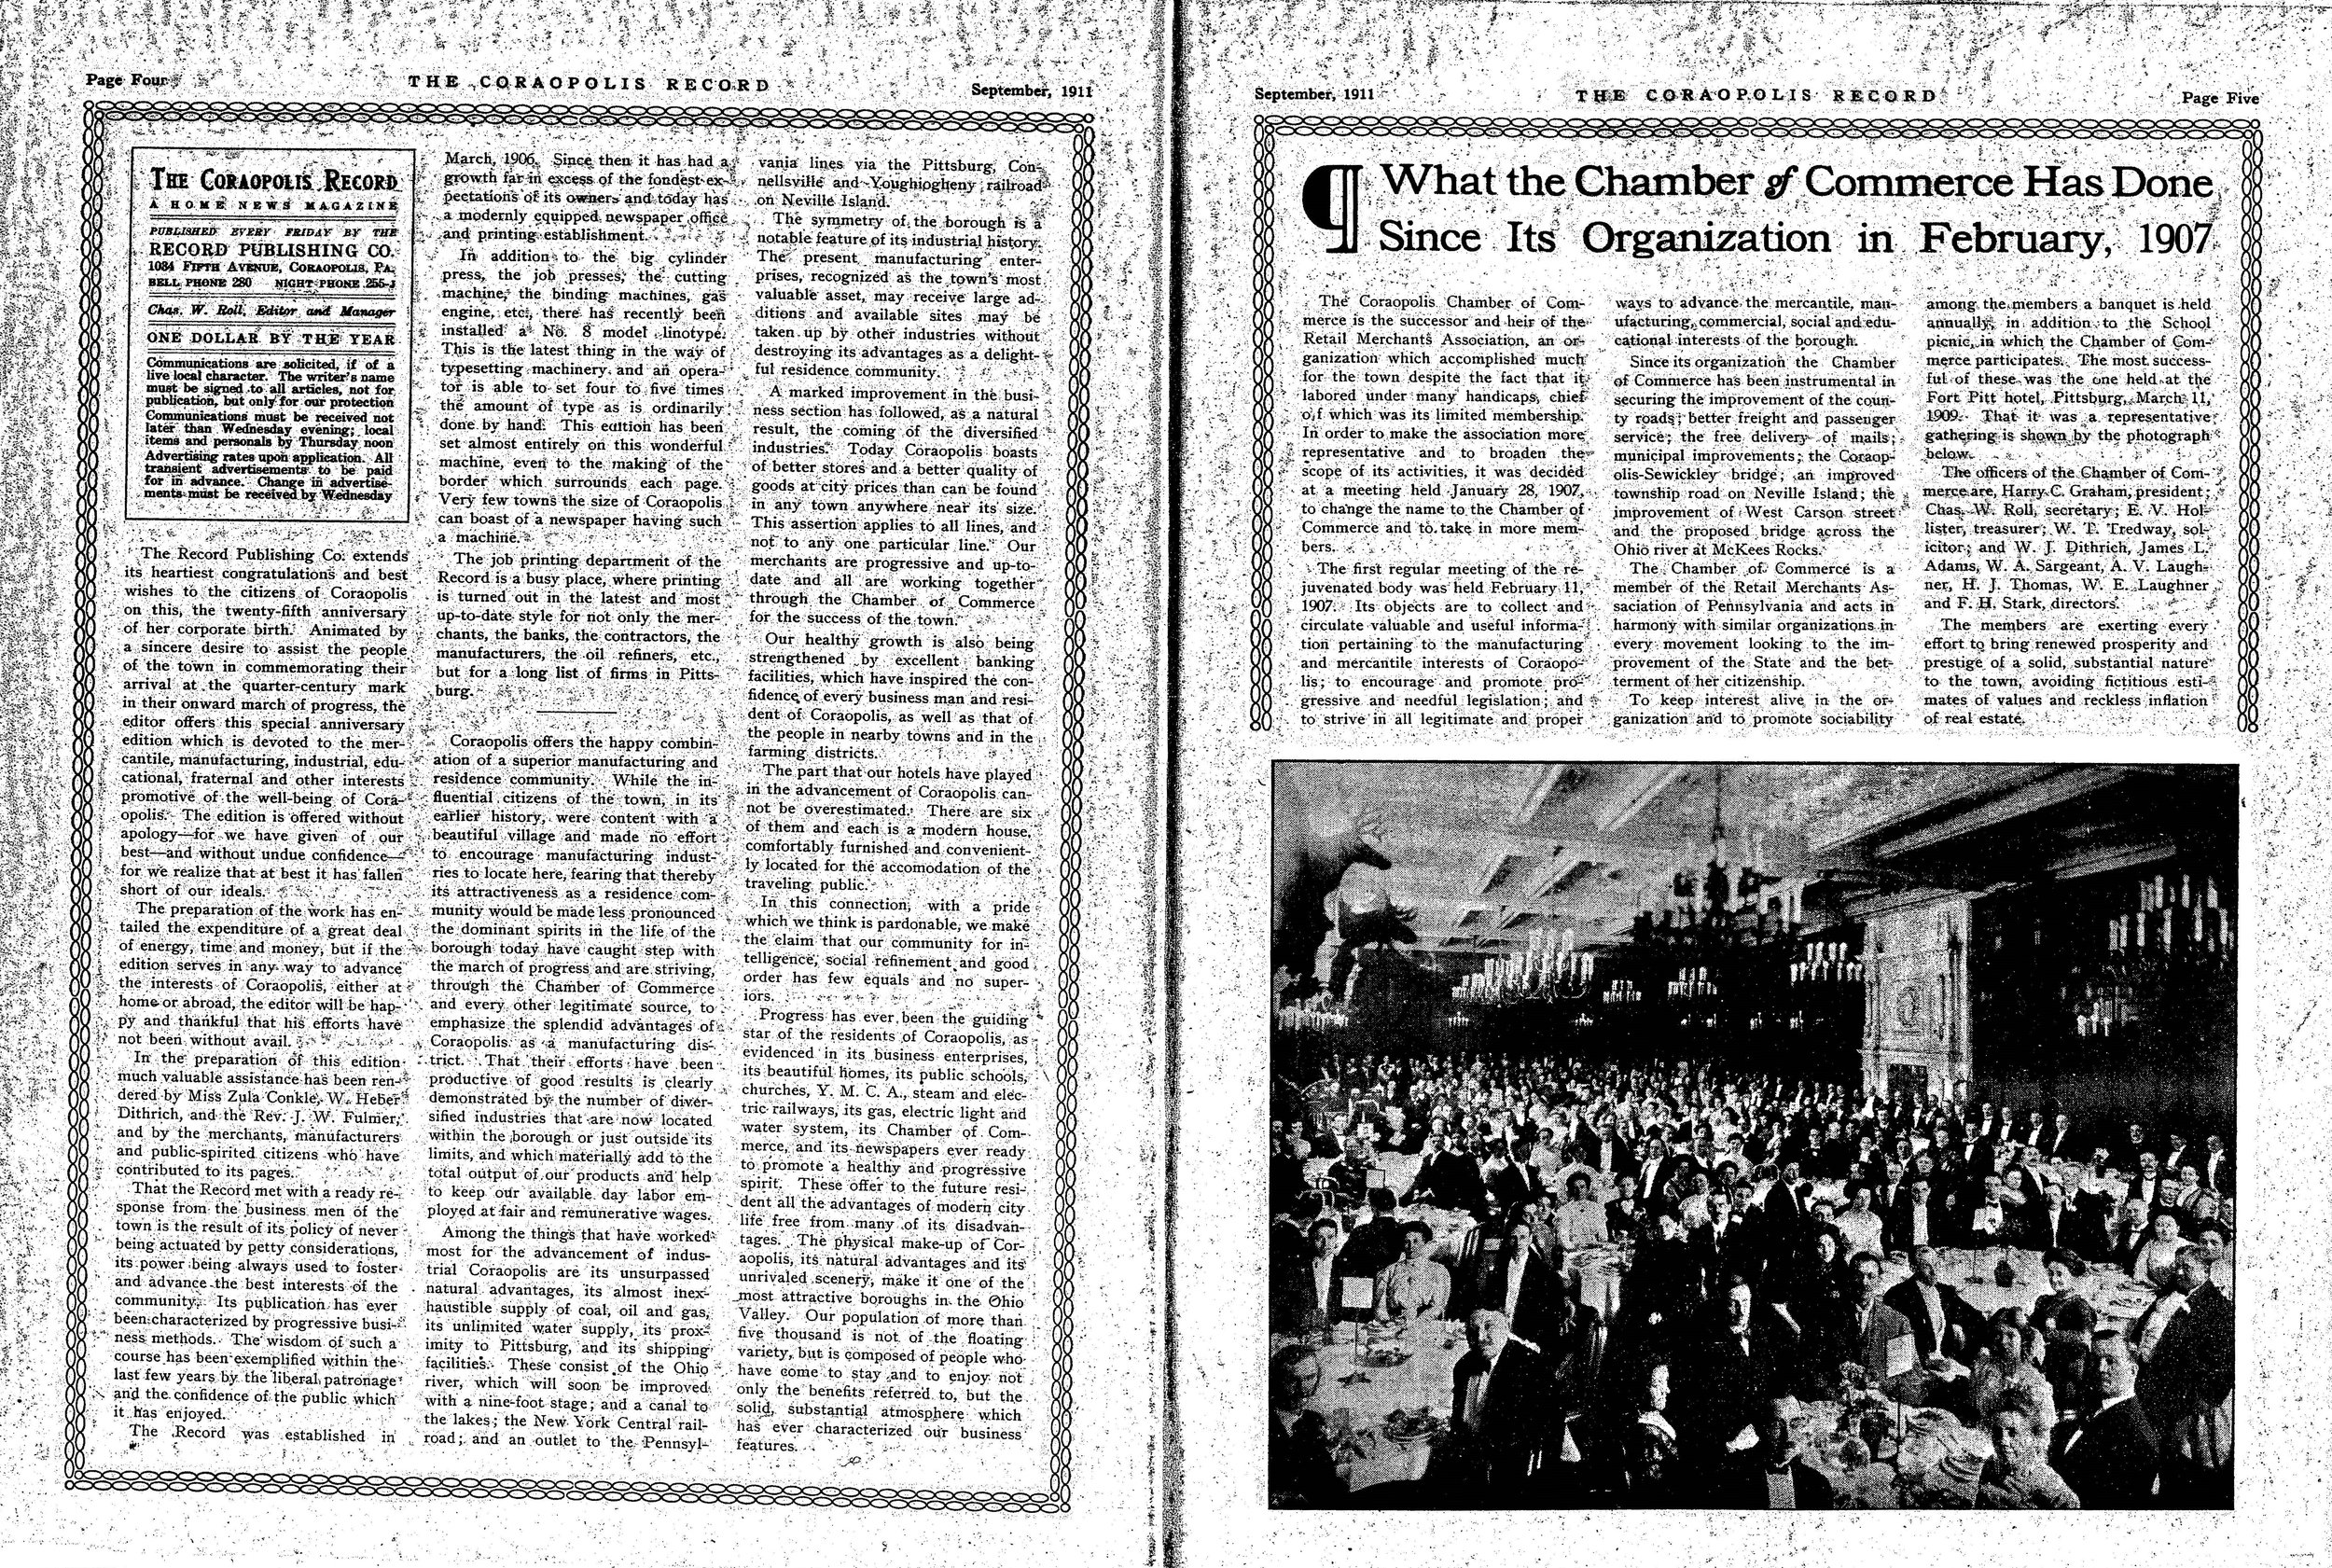 1911-09-15 The Coraopolis Record_Page_05.jpg